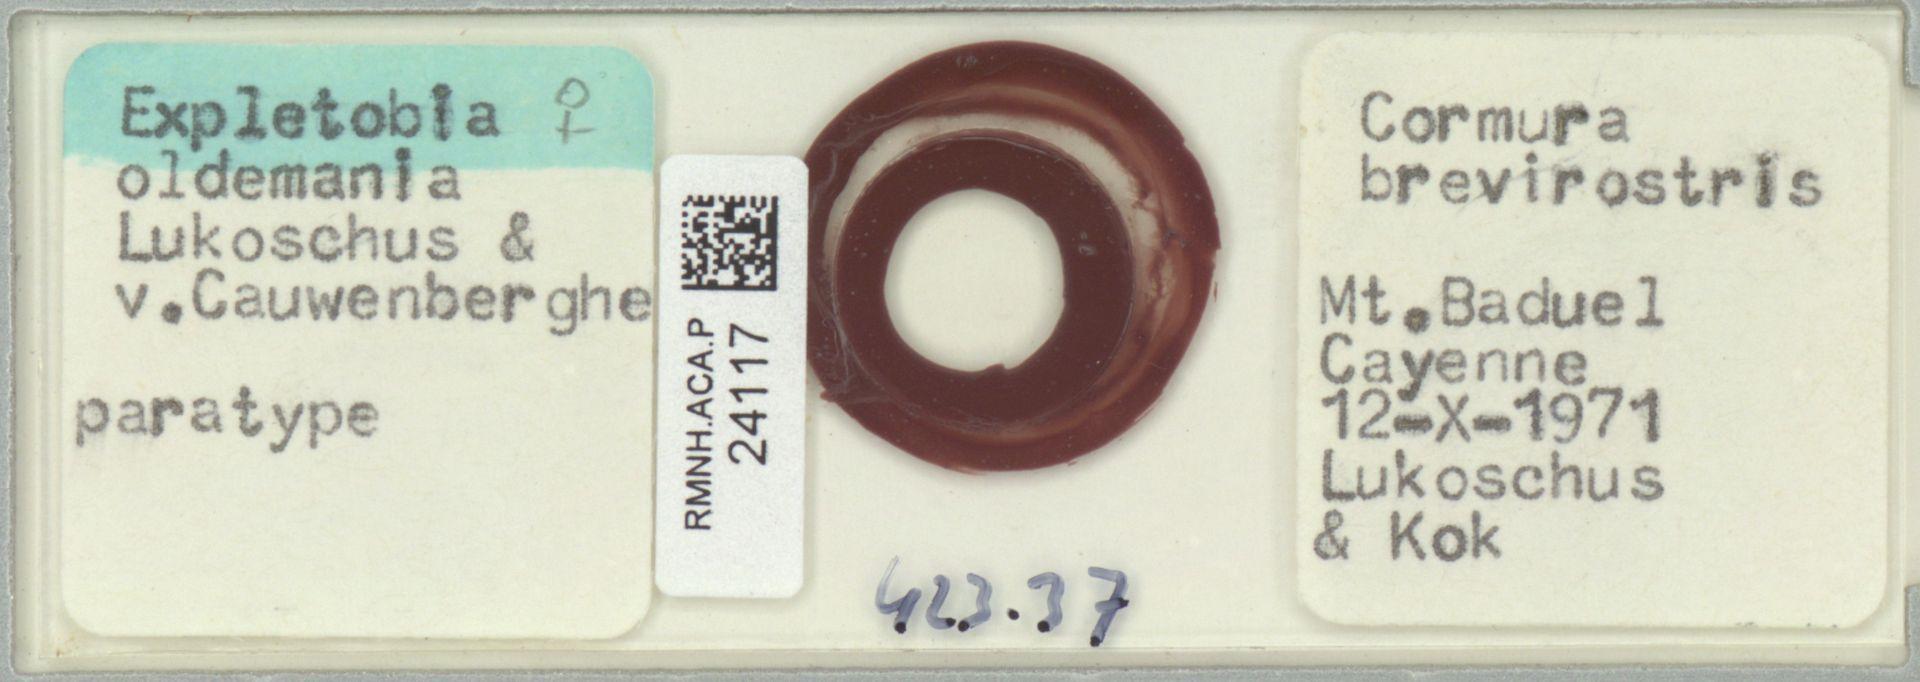 RMNH.ACA.P.24117 | Expletobia oldemania Lukoschus & v.Cauwenberghe